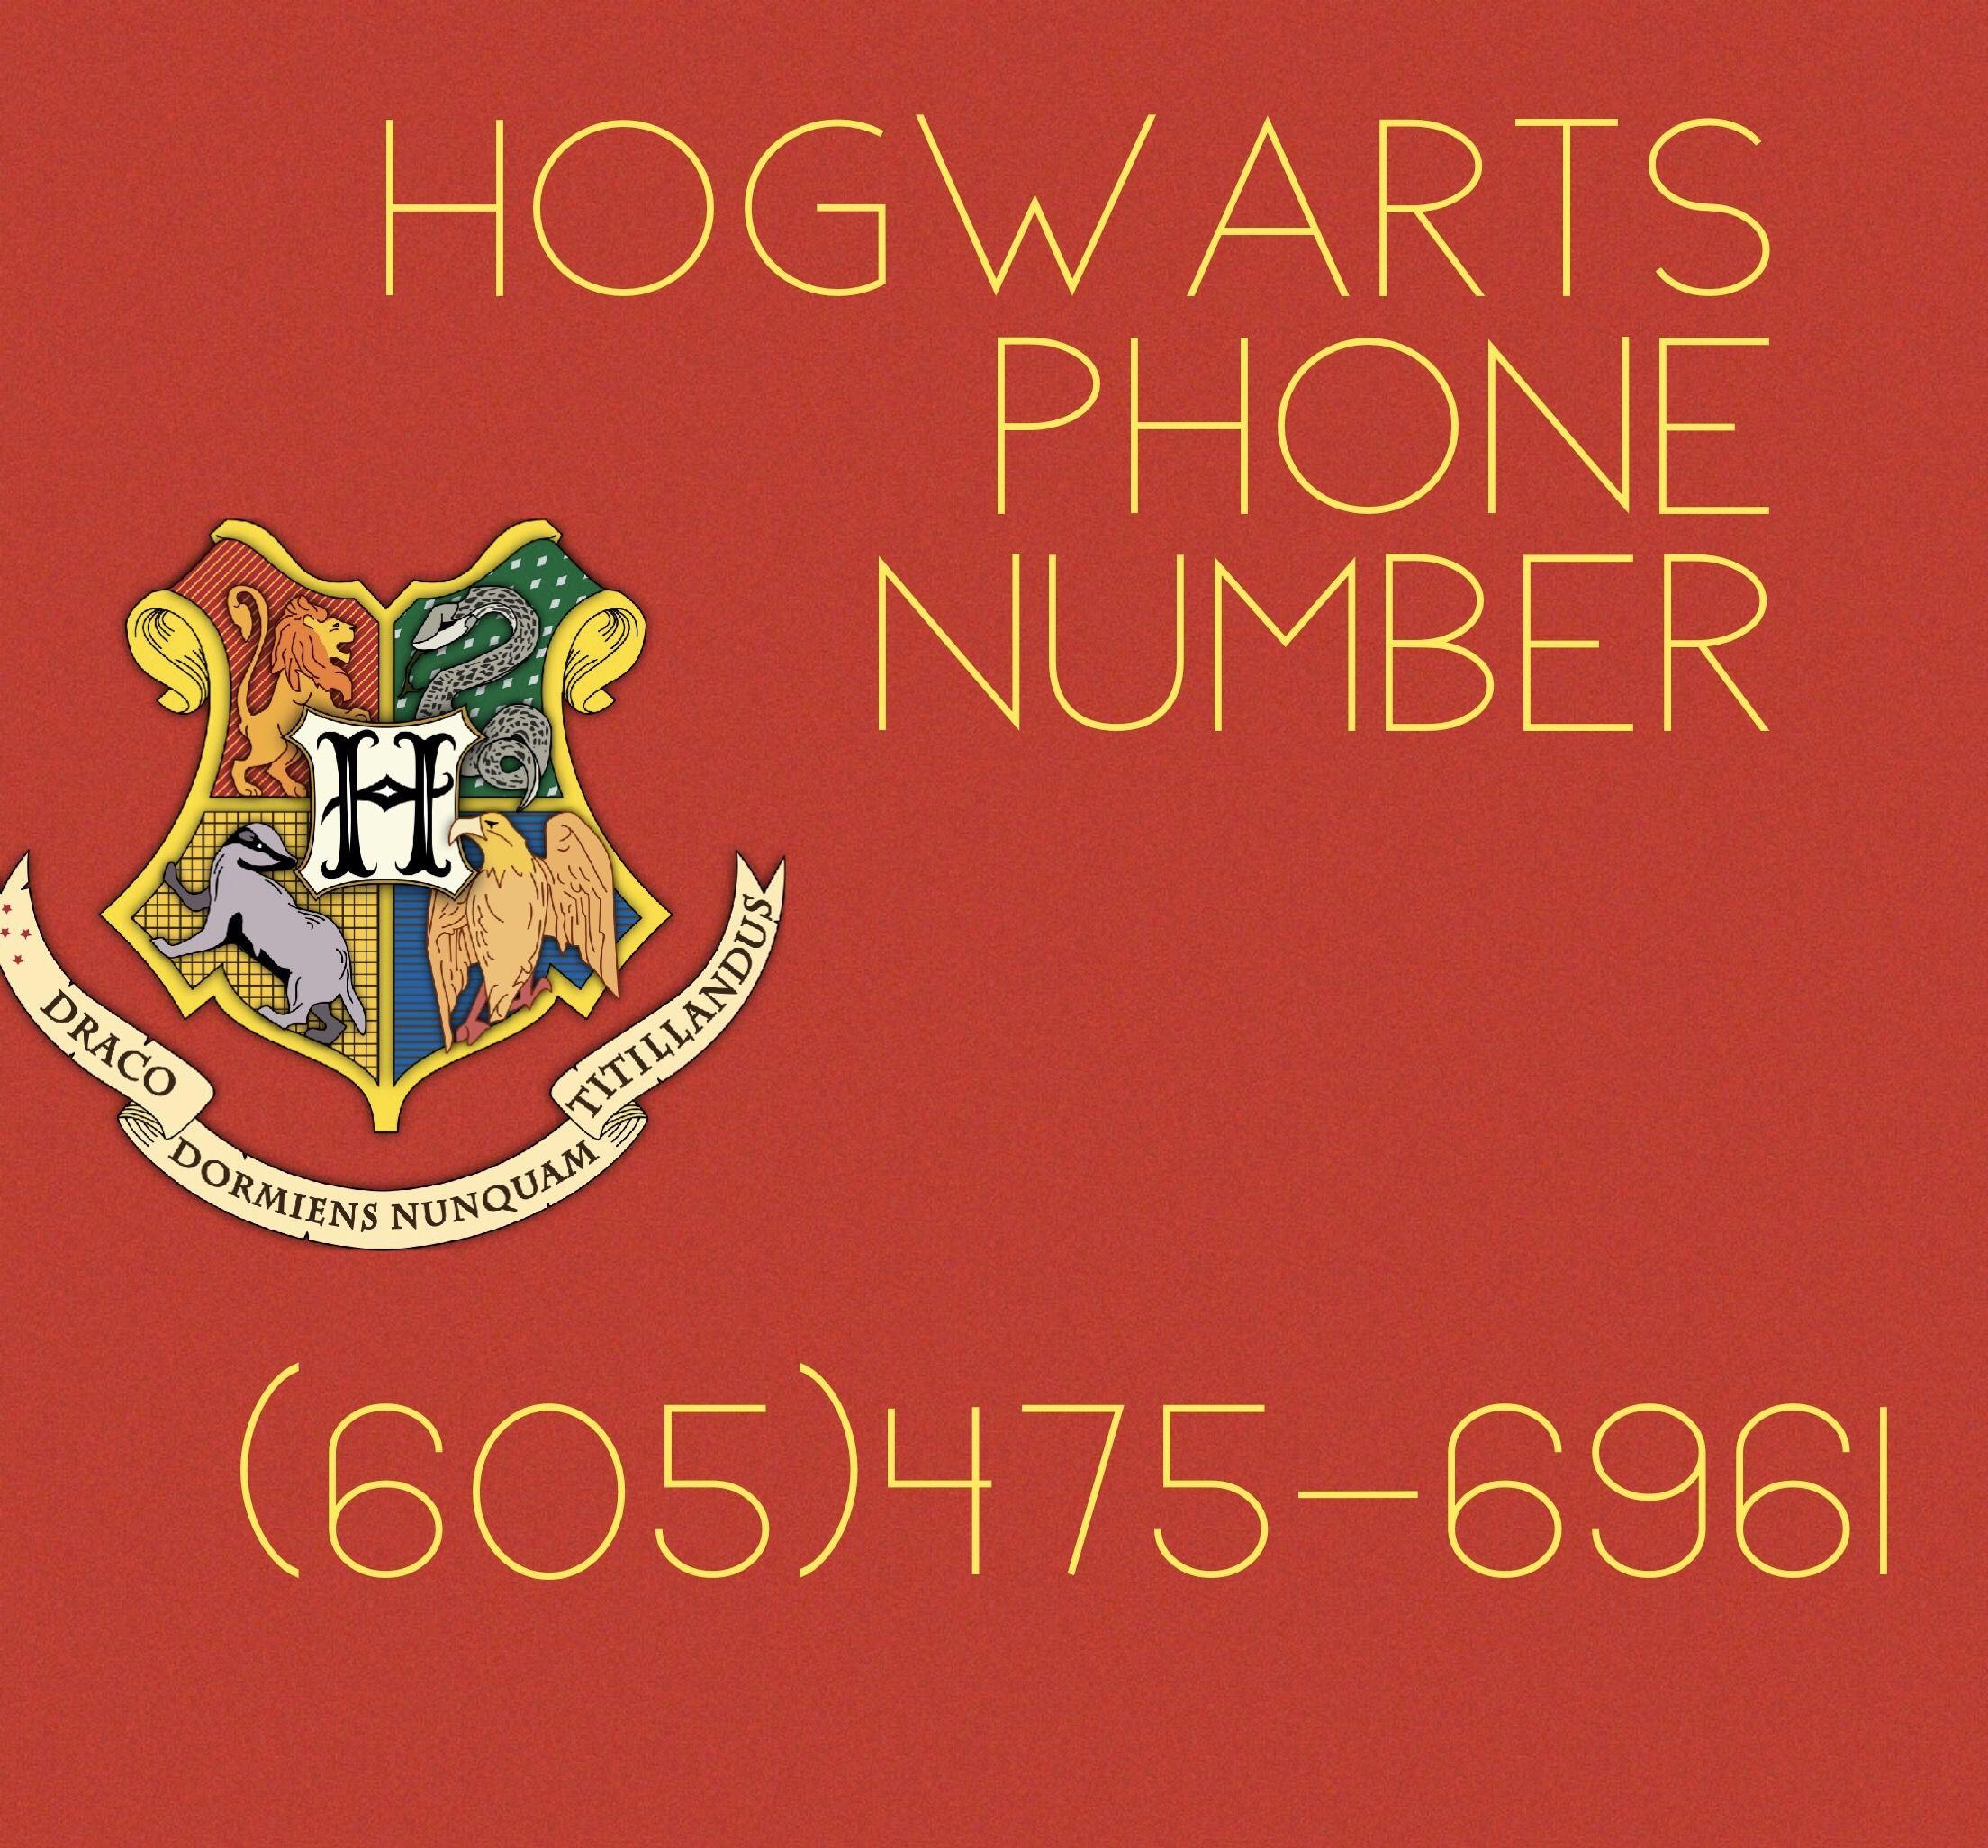 Hogwarts phone number it works i tried it it works